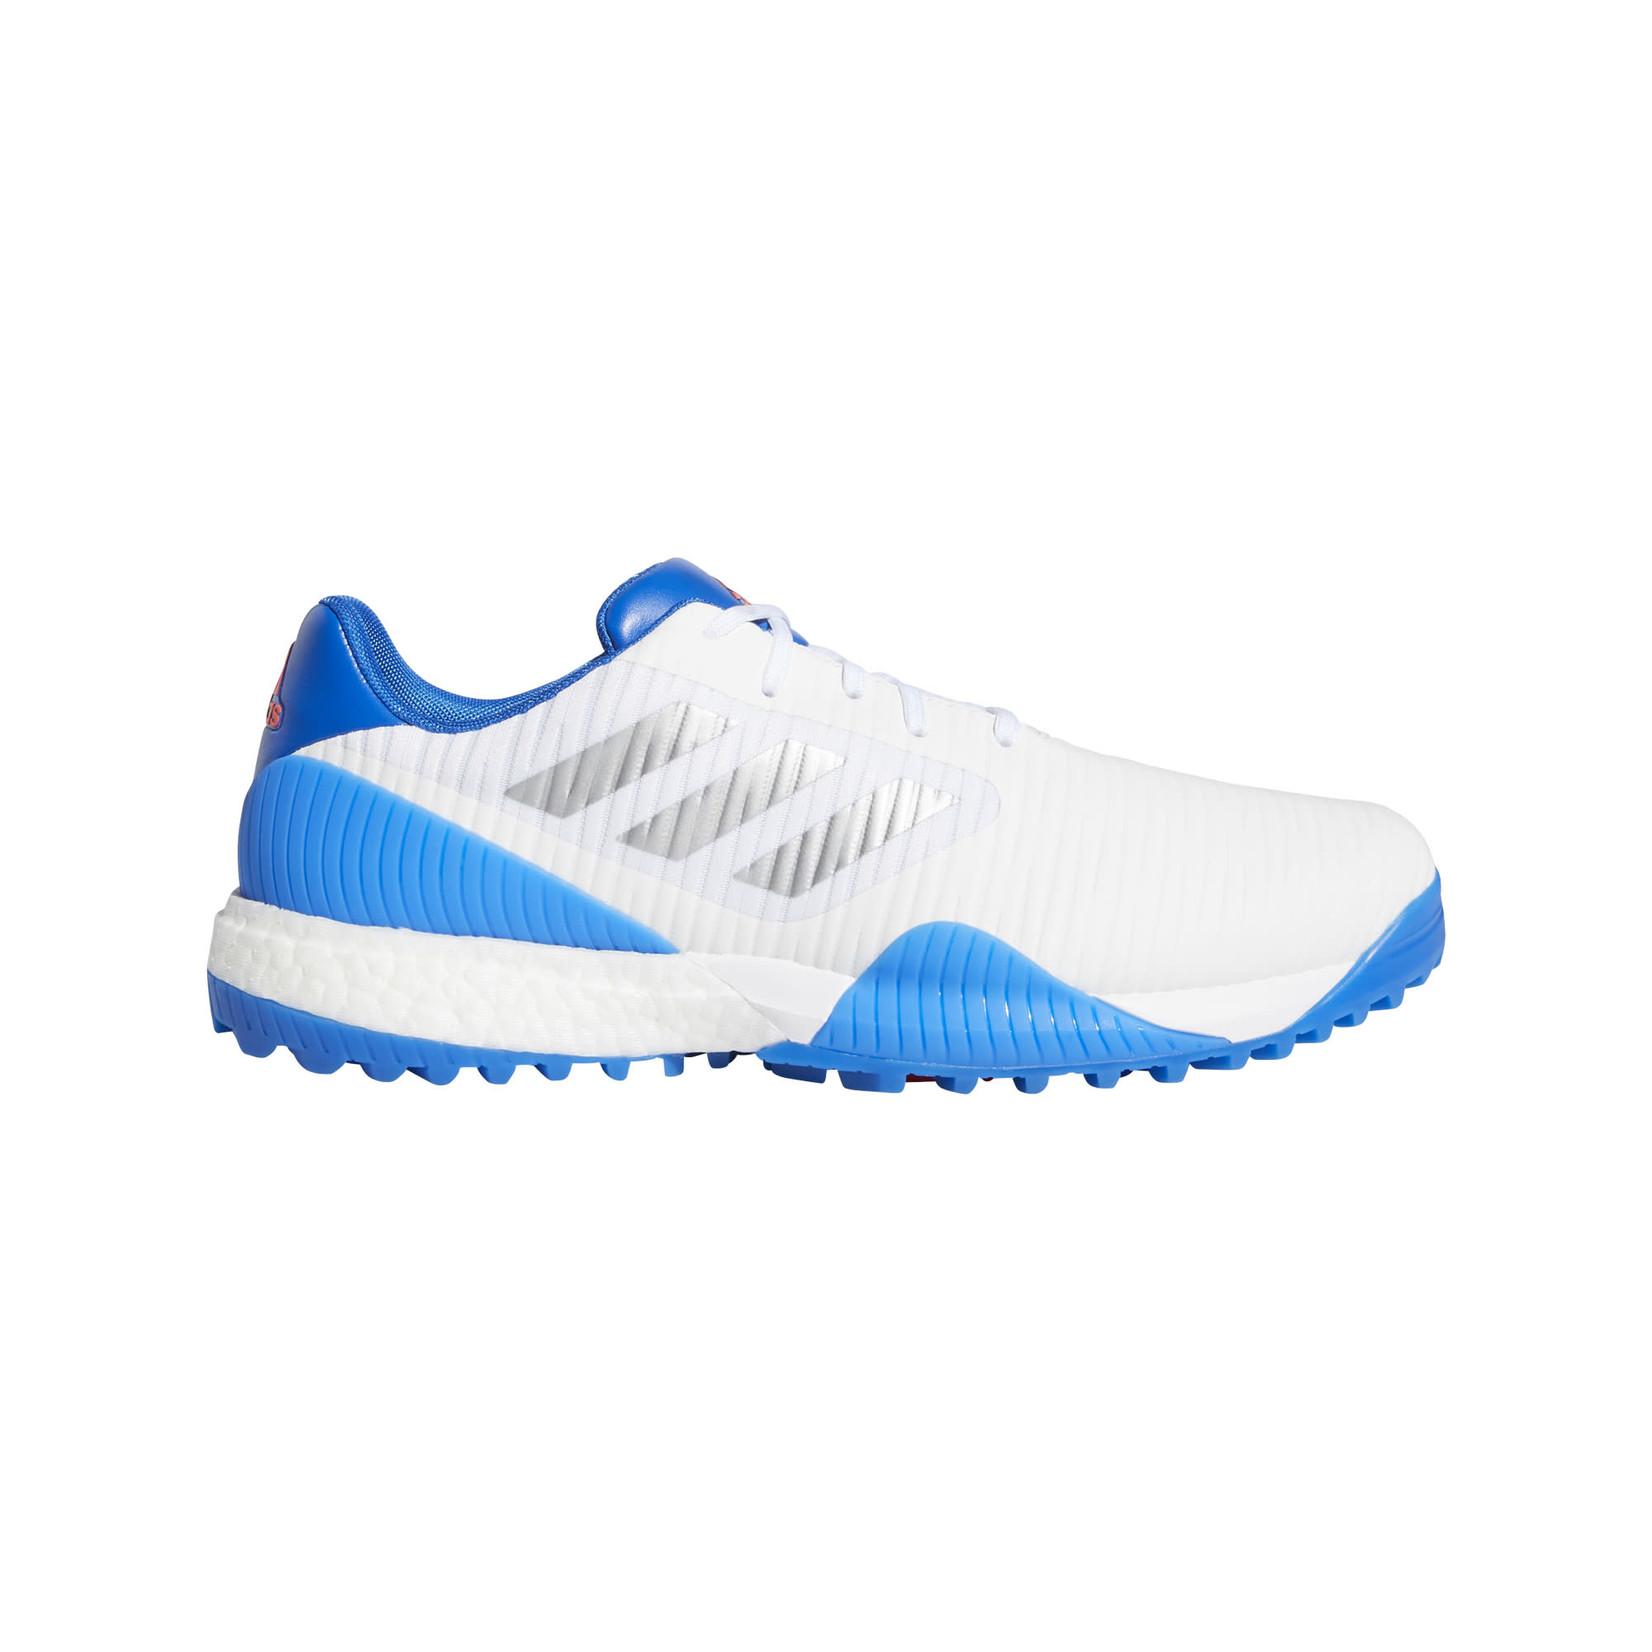 Adidas Adidas CodeChaos Sport White/Blue 7